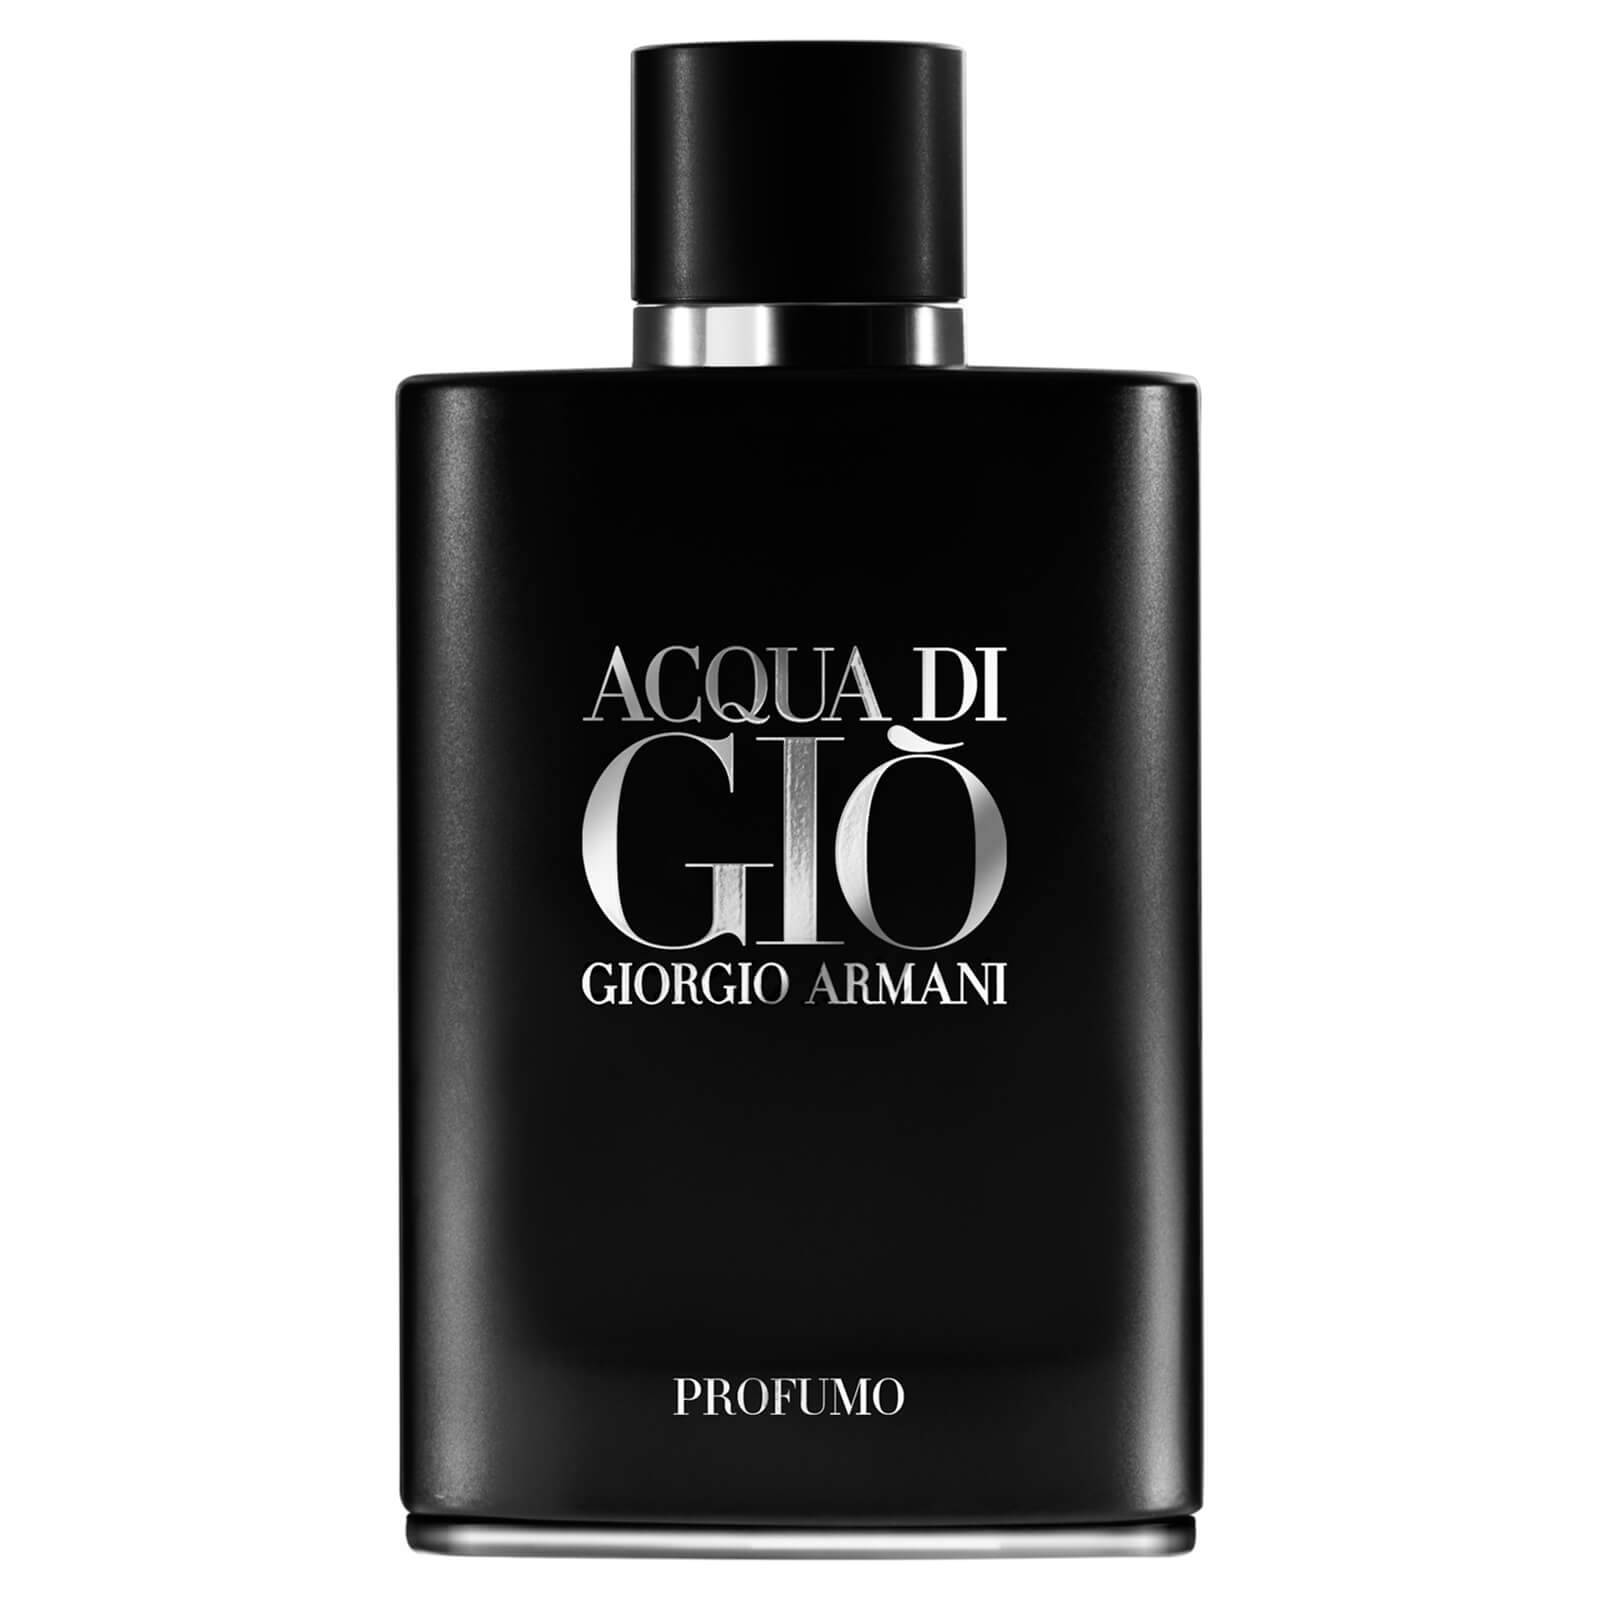 Giorgio Armani Acqua Di Gio Profumo Eau de Parfum - 125ml